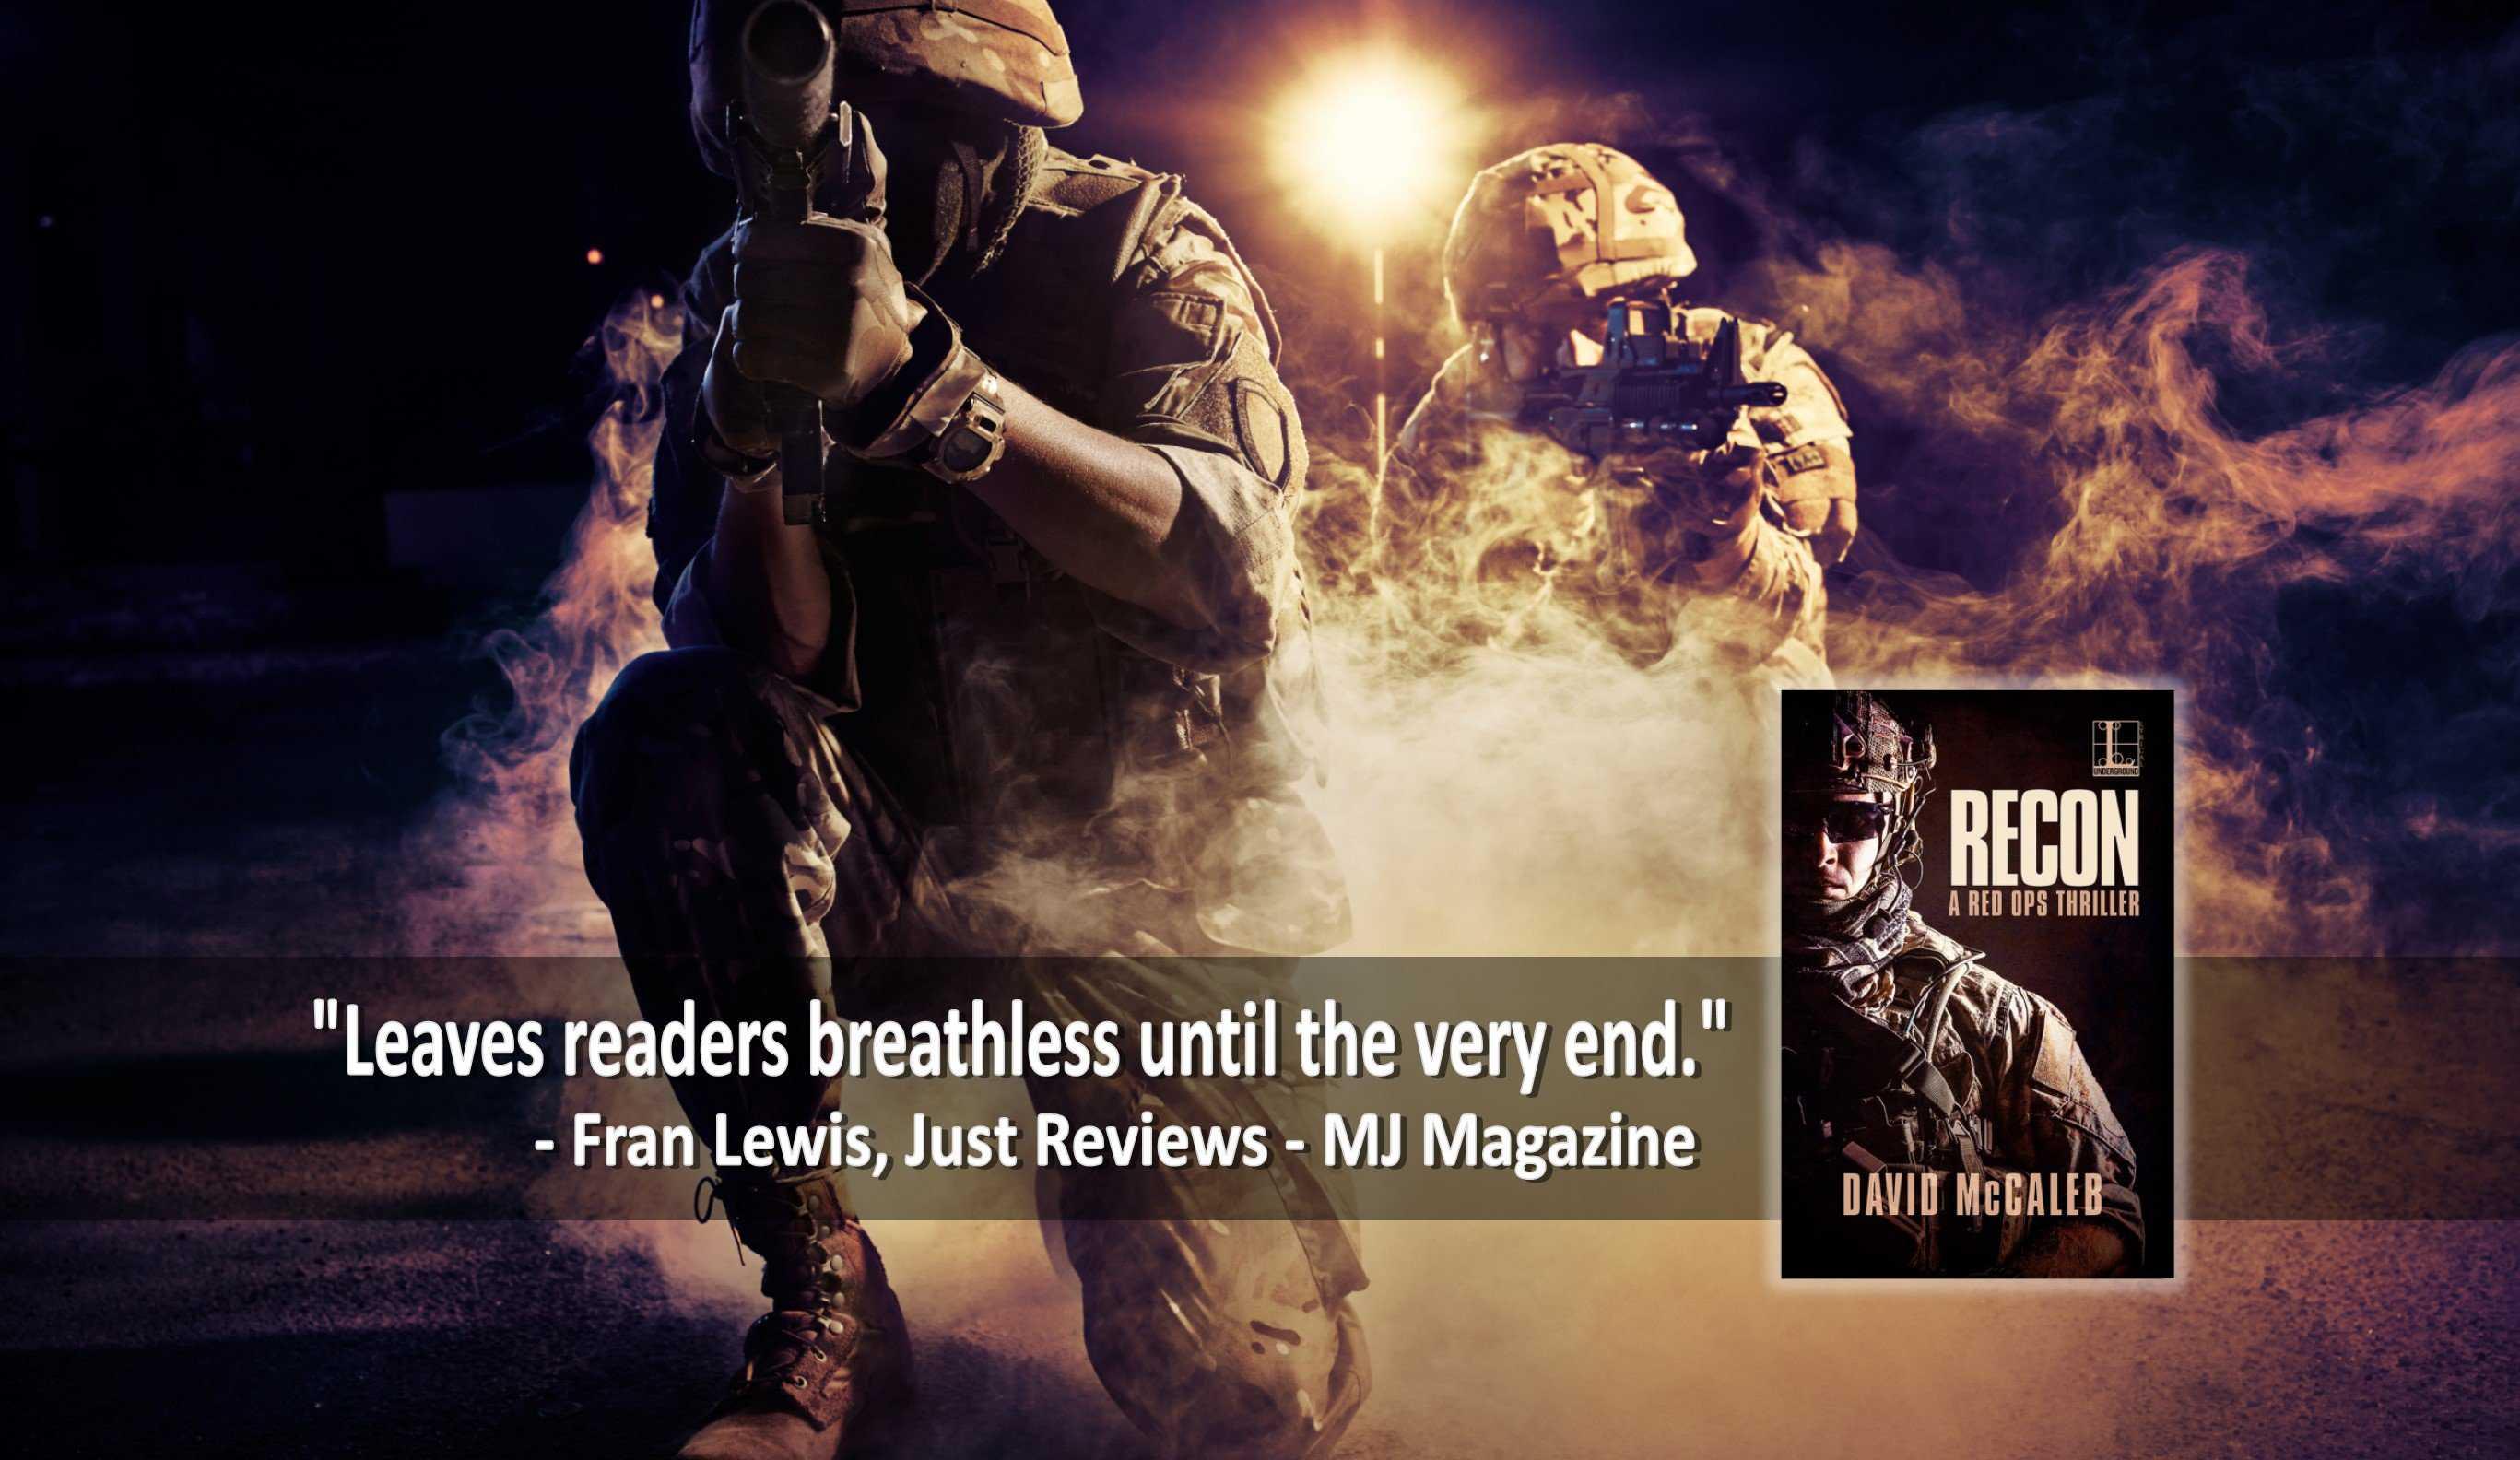 Header RECON w blurb 2, pair of military operators, night scene with smoke.